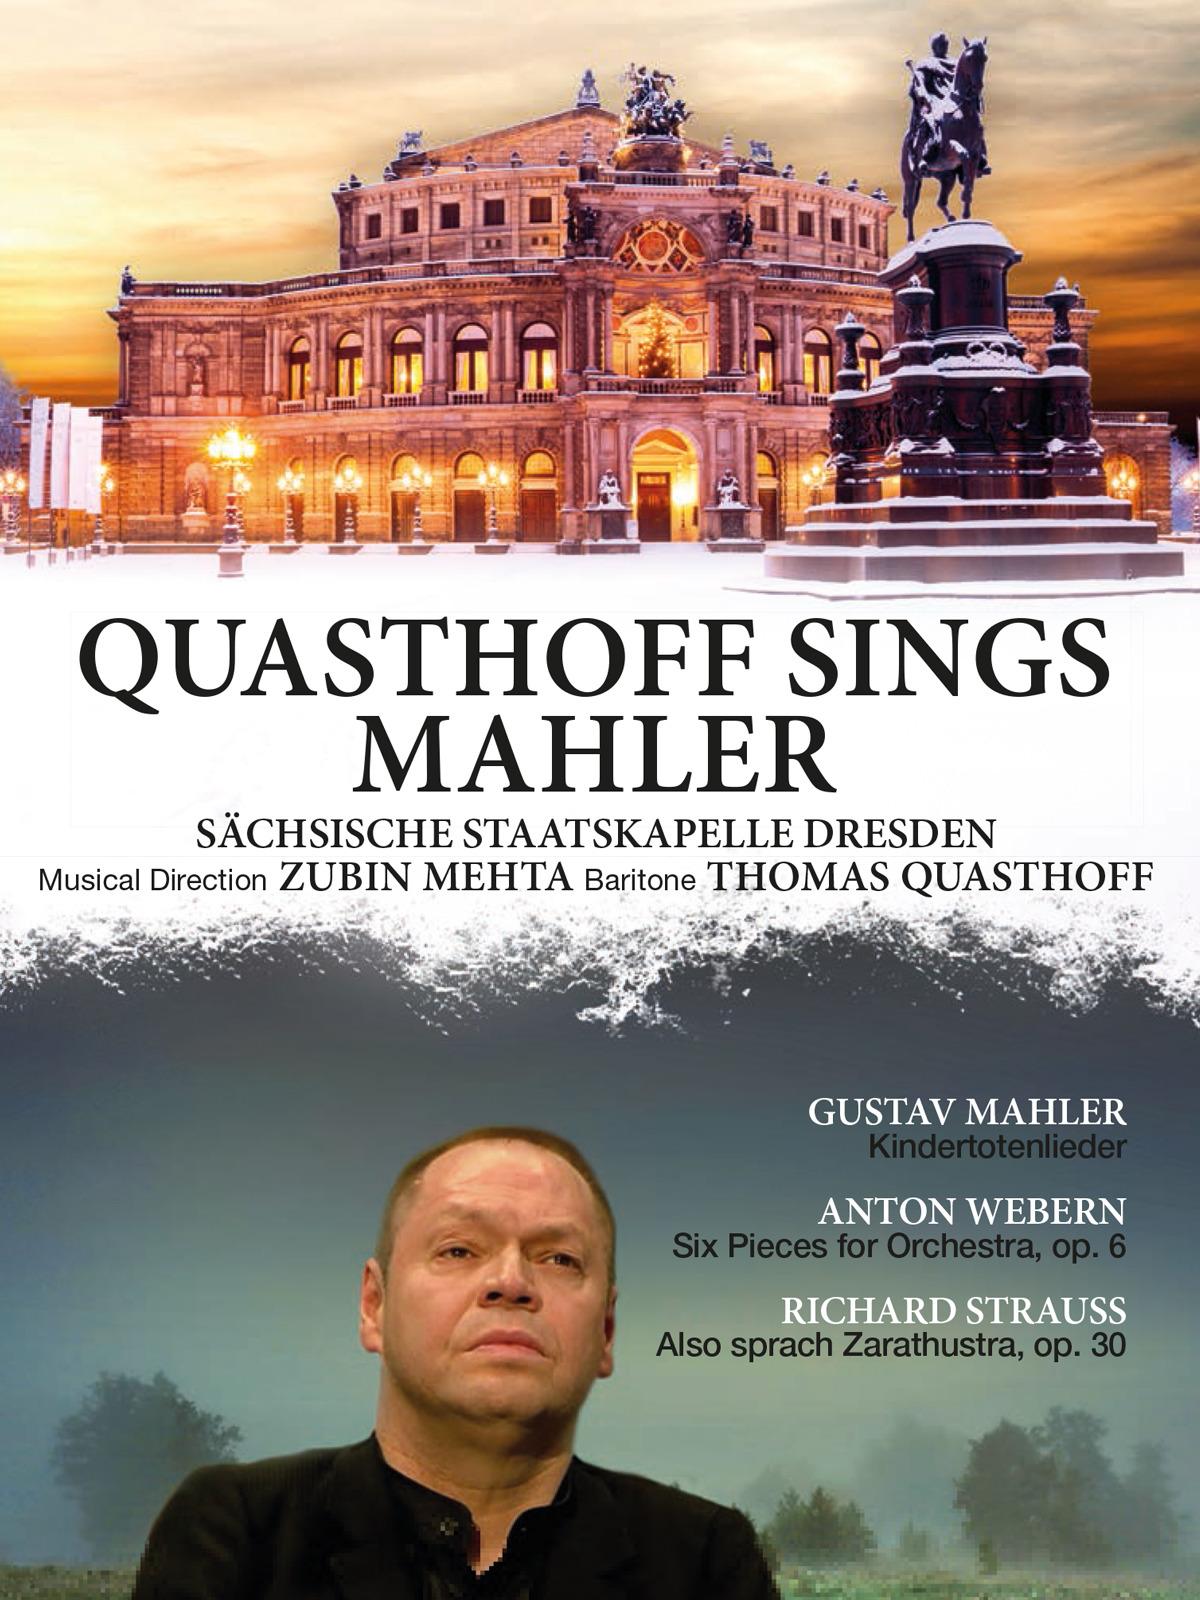 Quasthoff sings Mahler | Mahler, Webern, Strauss | Sächsische Staatskapelle Dresden: Zubin Mehta | Arthaus Musik